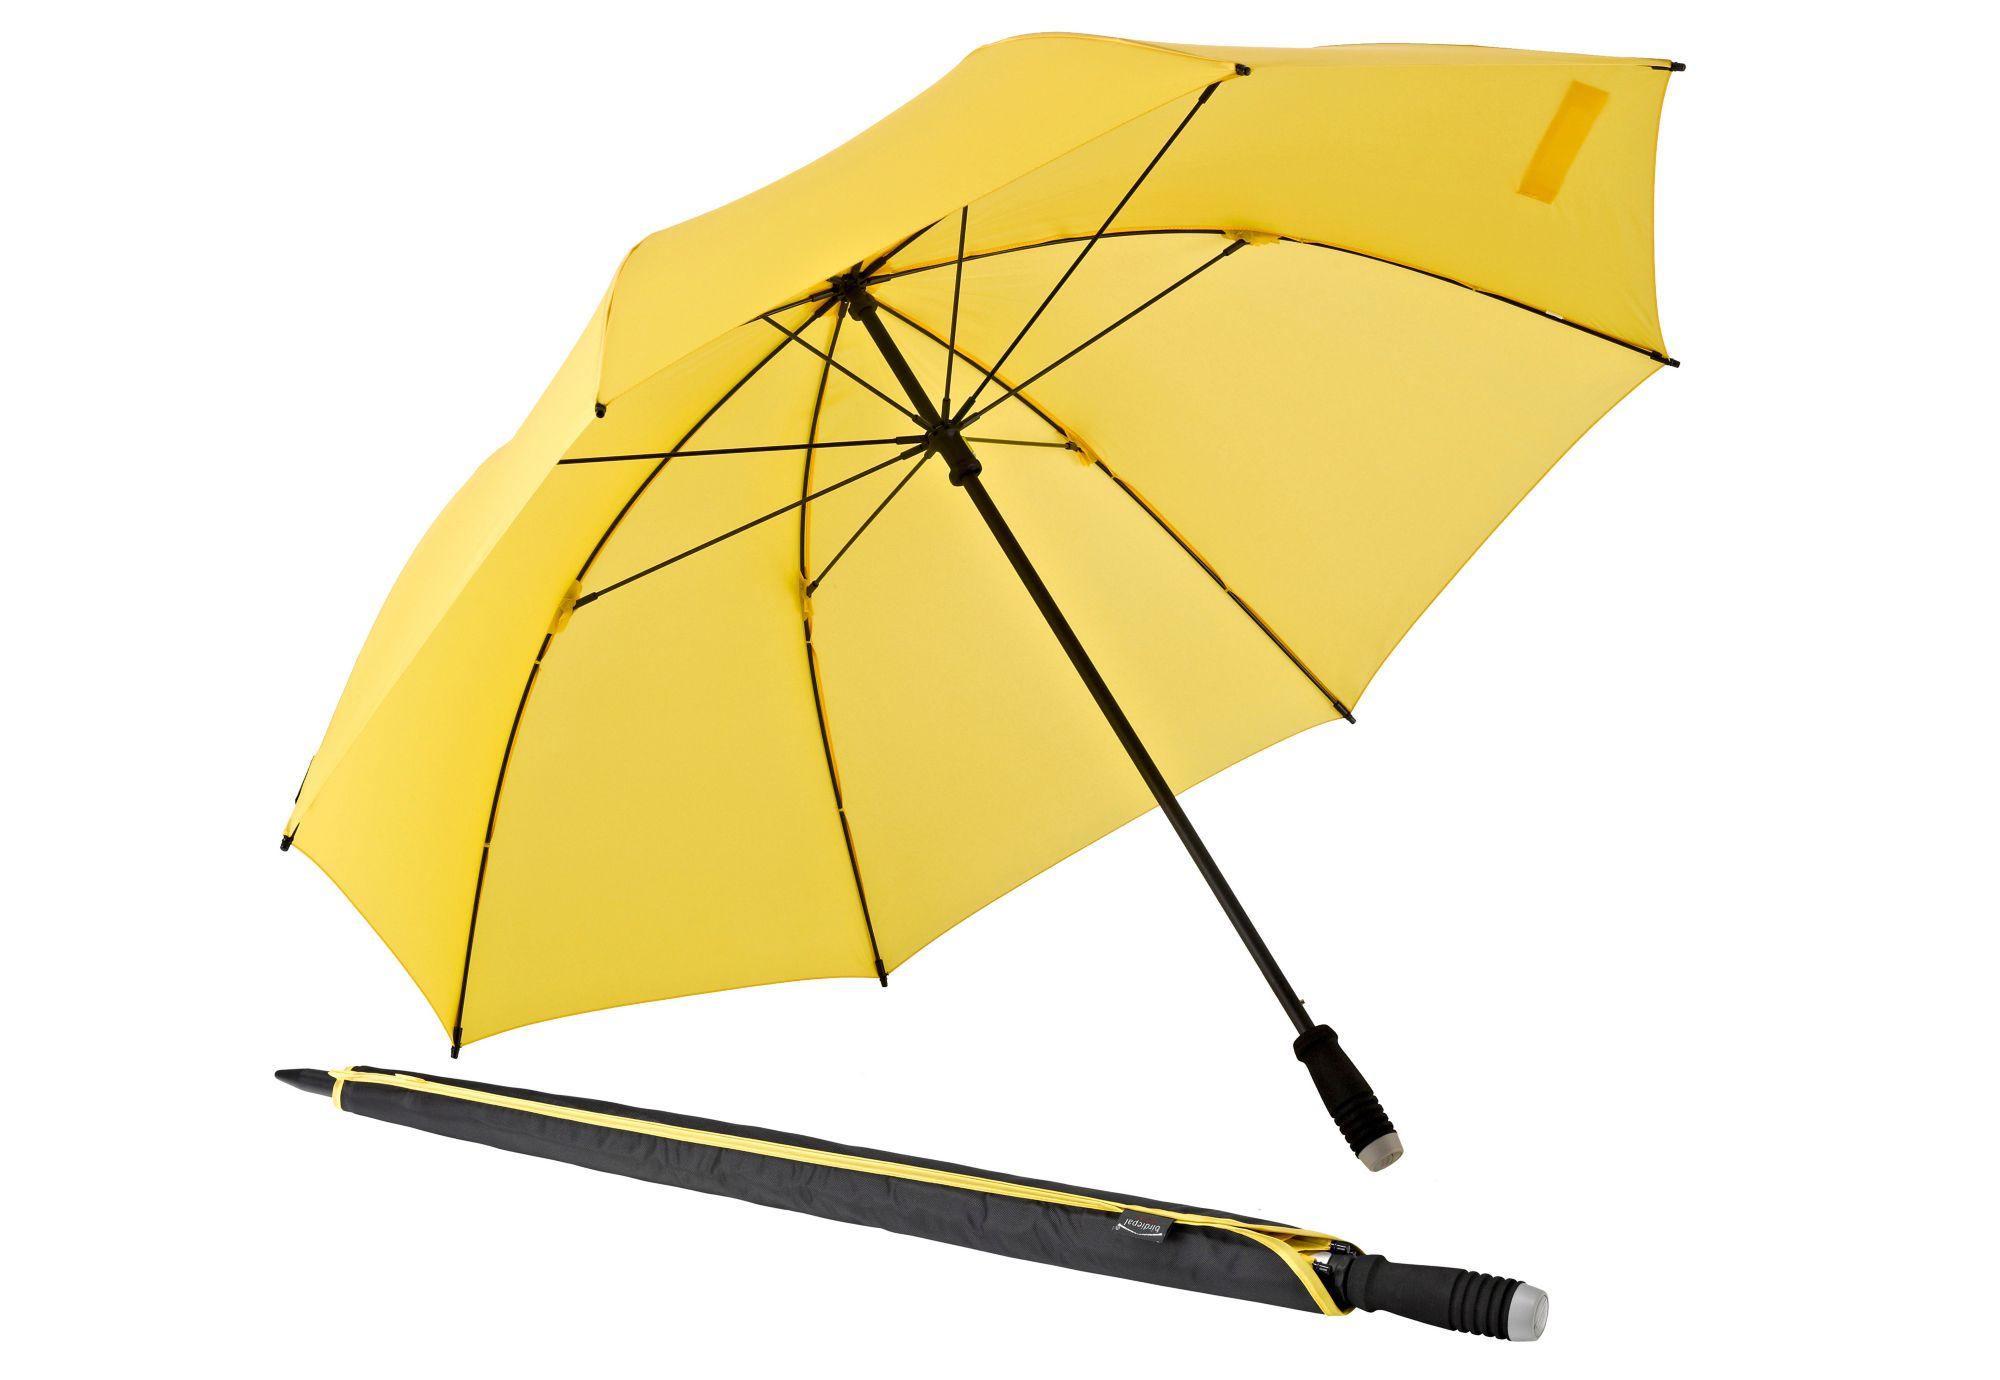 EUROSCHIRM® Euroschirm® Regenschirm Golfschirm, »birdiepal® compact«